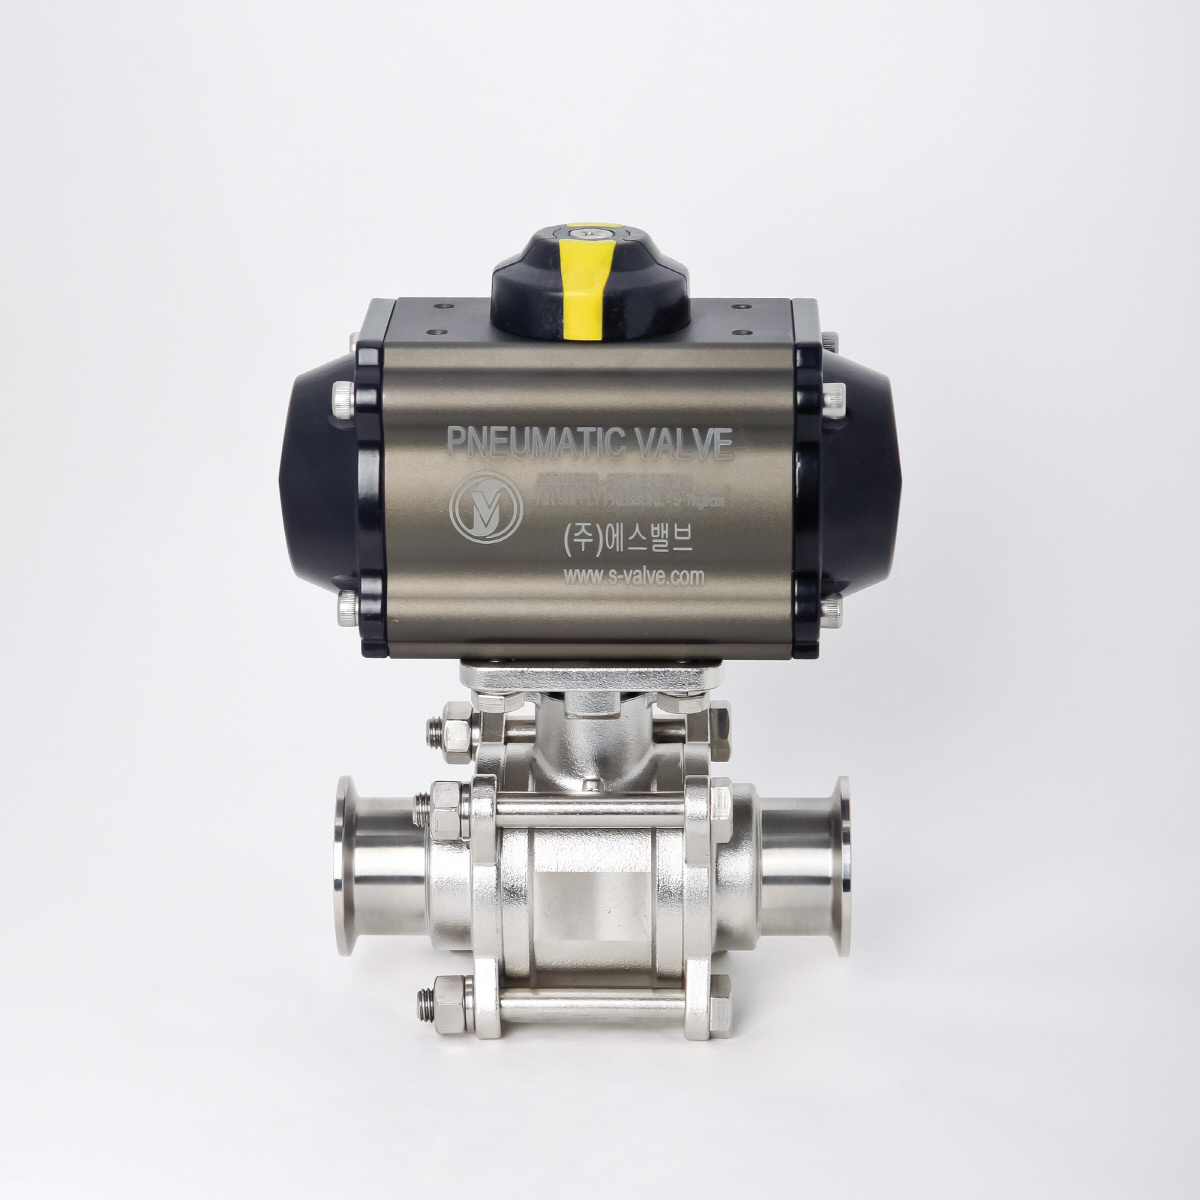 S-valve_0086.jpg